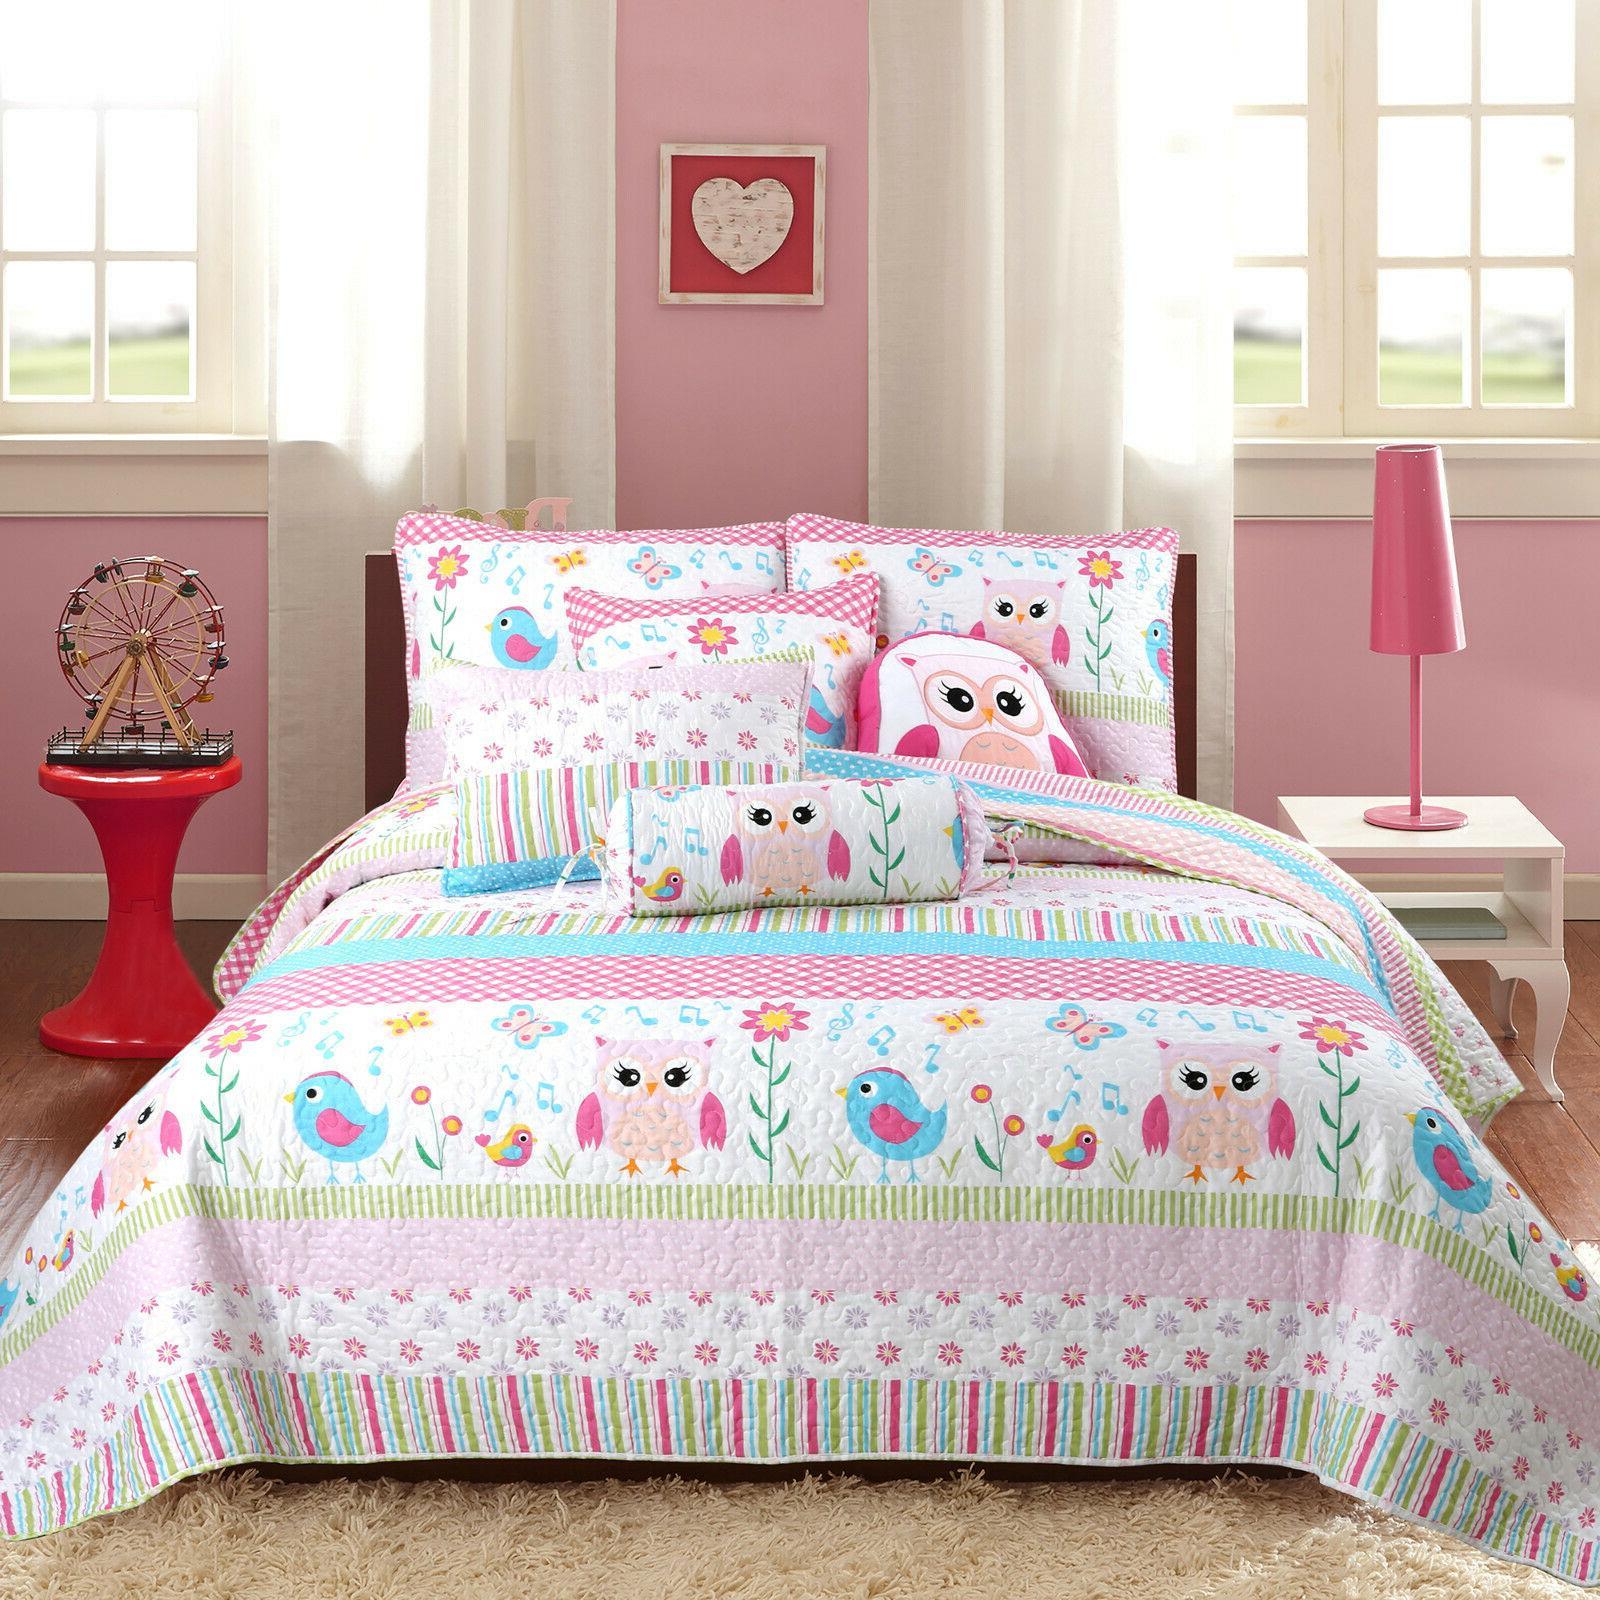 Home Print Girl Bedspread,